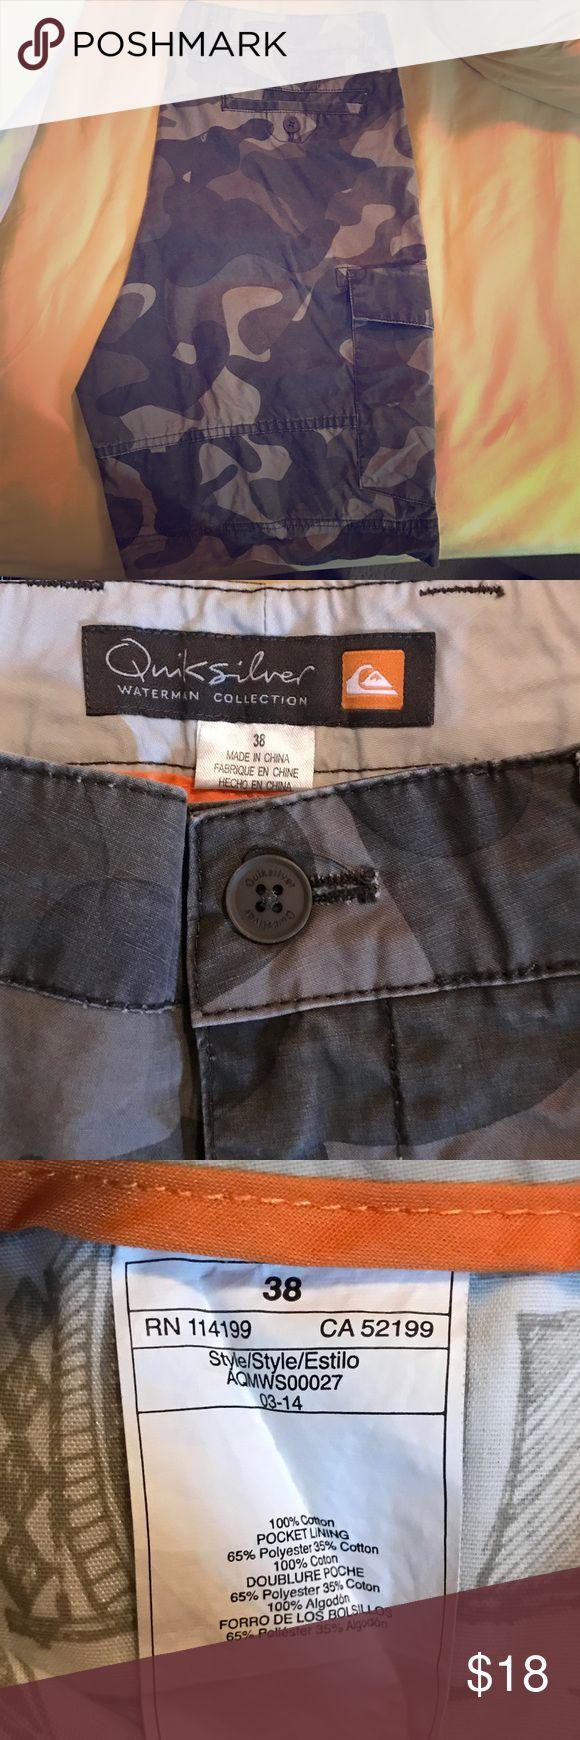 Quiksilver men's camo shorts size 38 Quicksilver camo shorts - great condition size 38 Quiksilver Shorts